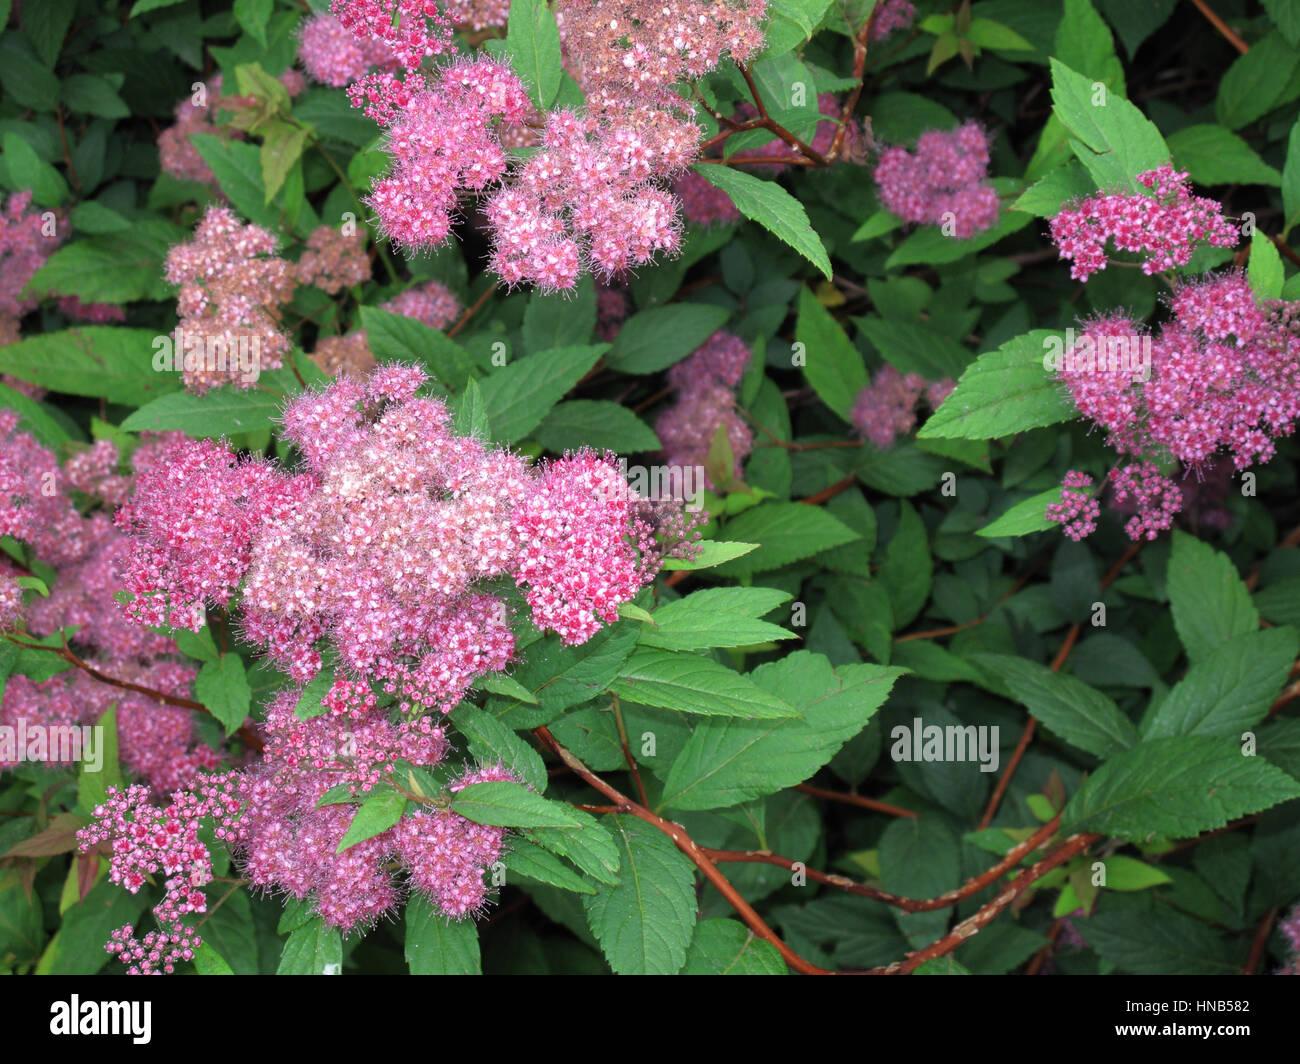 Flower Plant Japanese Spirea Pink Stock Photos Flower Plant